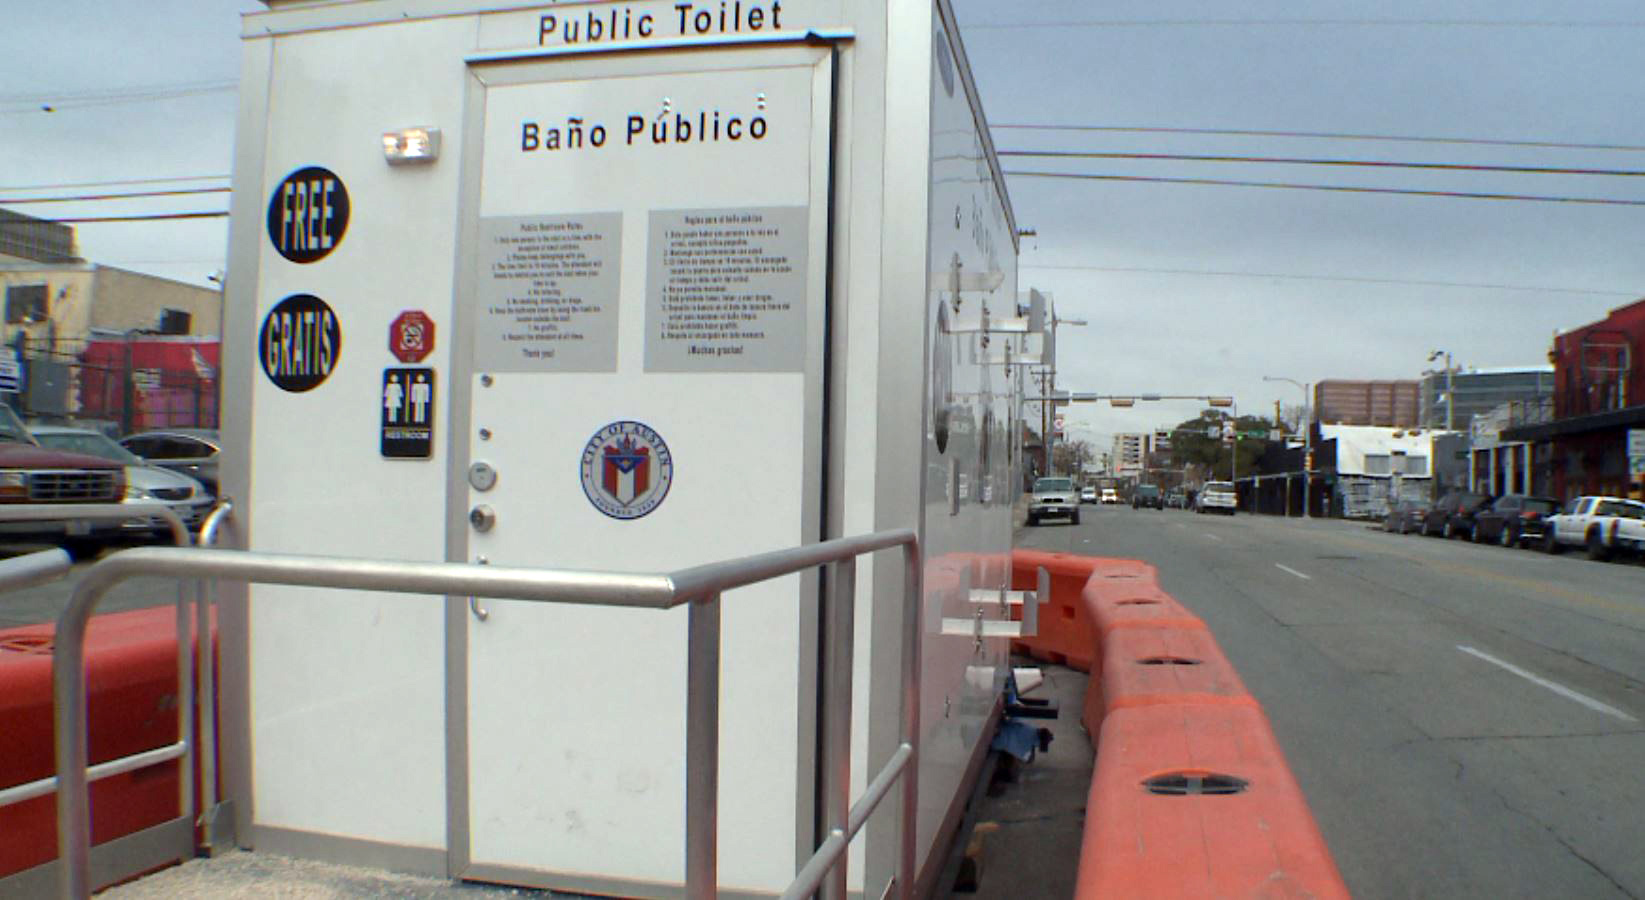 austin public toilet restroom_618326